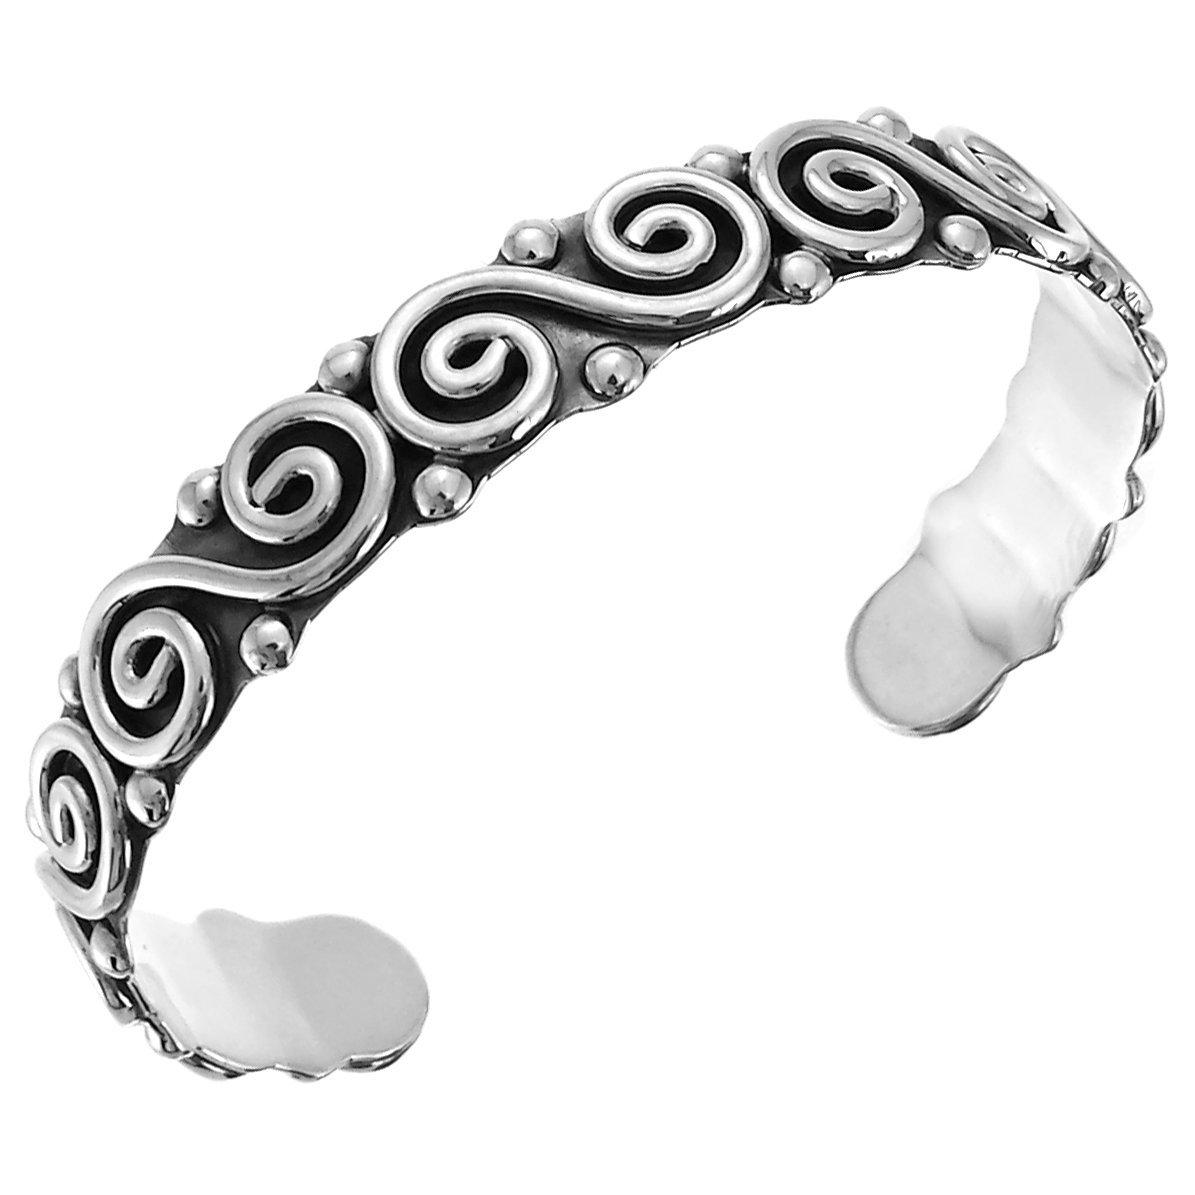 Aleria Designs Sterling Silver Oxidized Beaded Spirals Cuff Bracelet